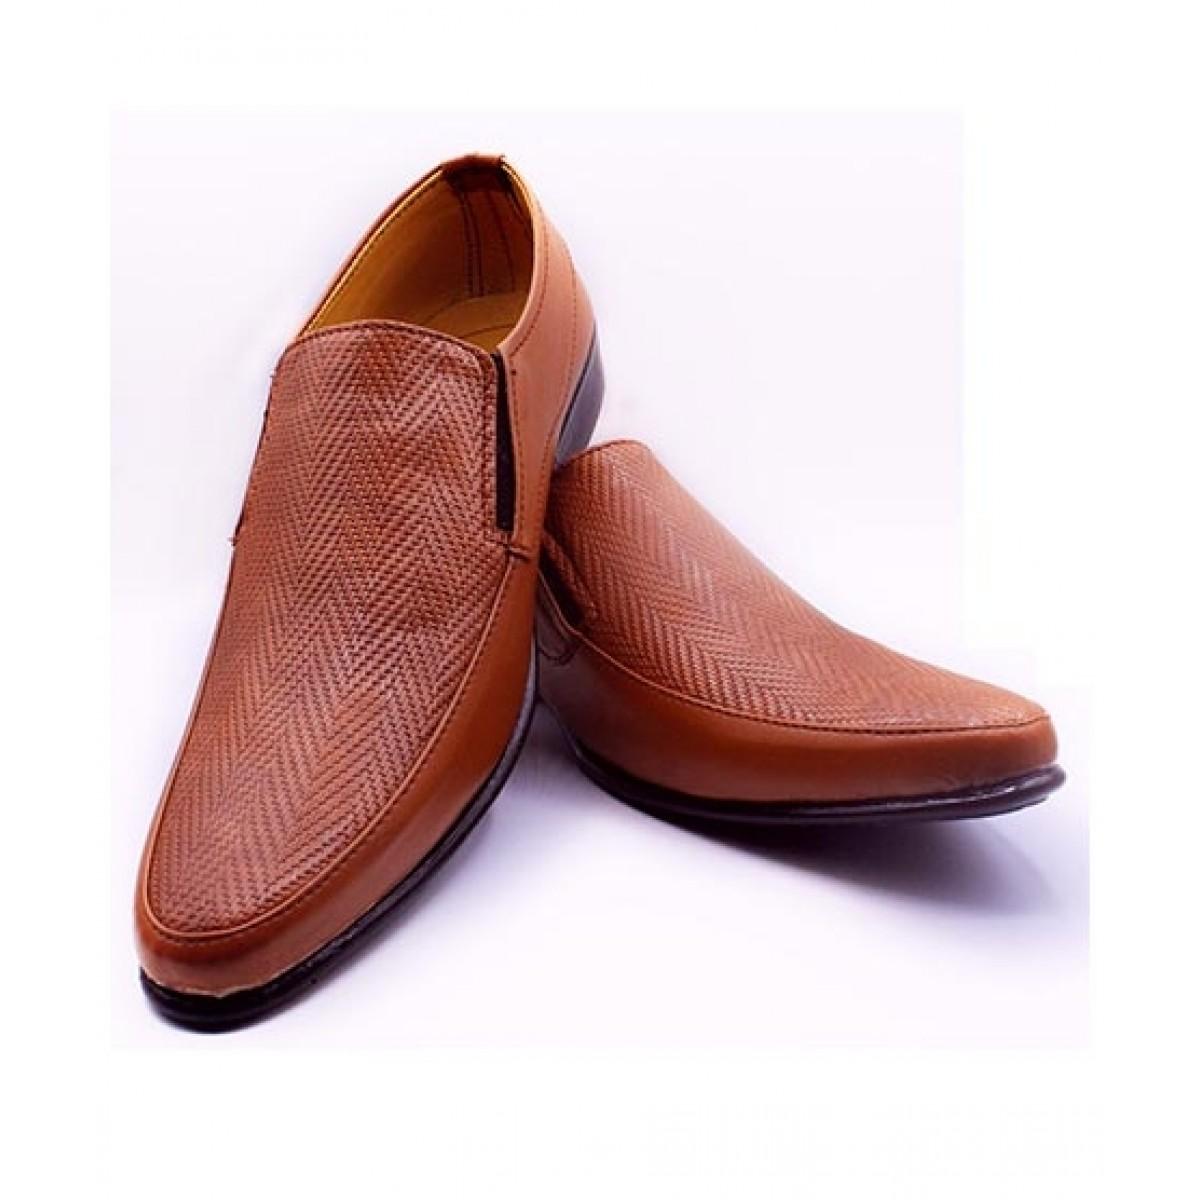 MOZAX Formal Shoes For Men Brown (BR-0008)